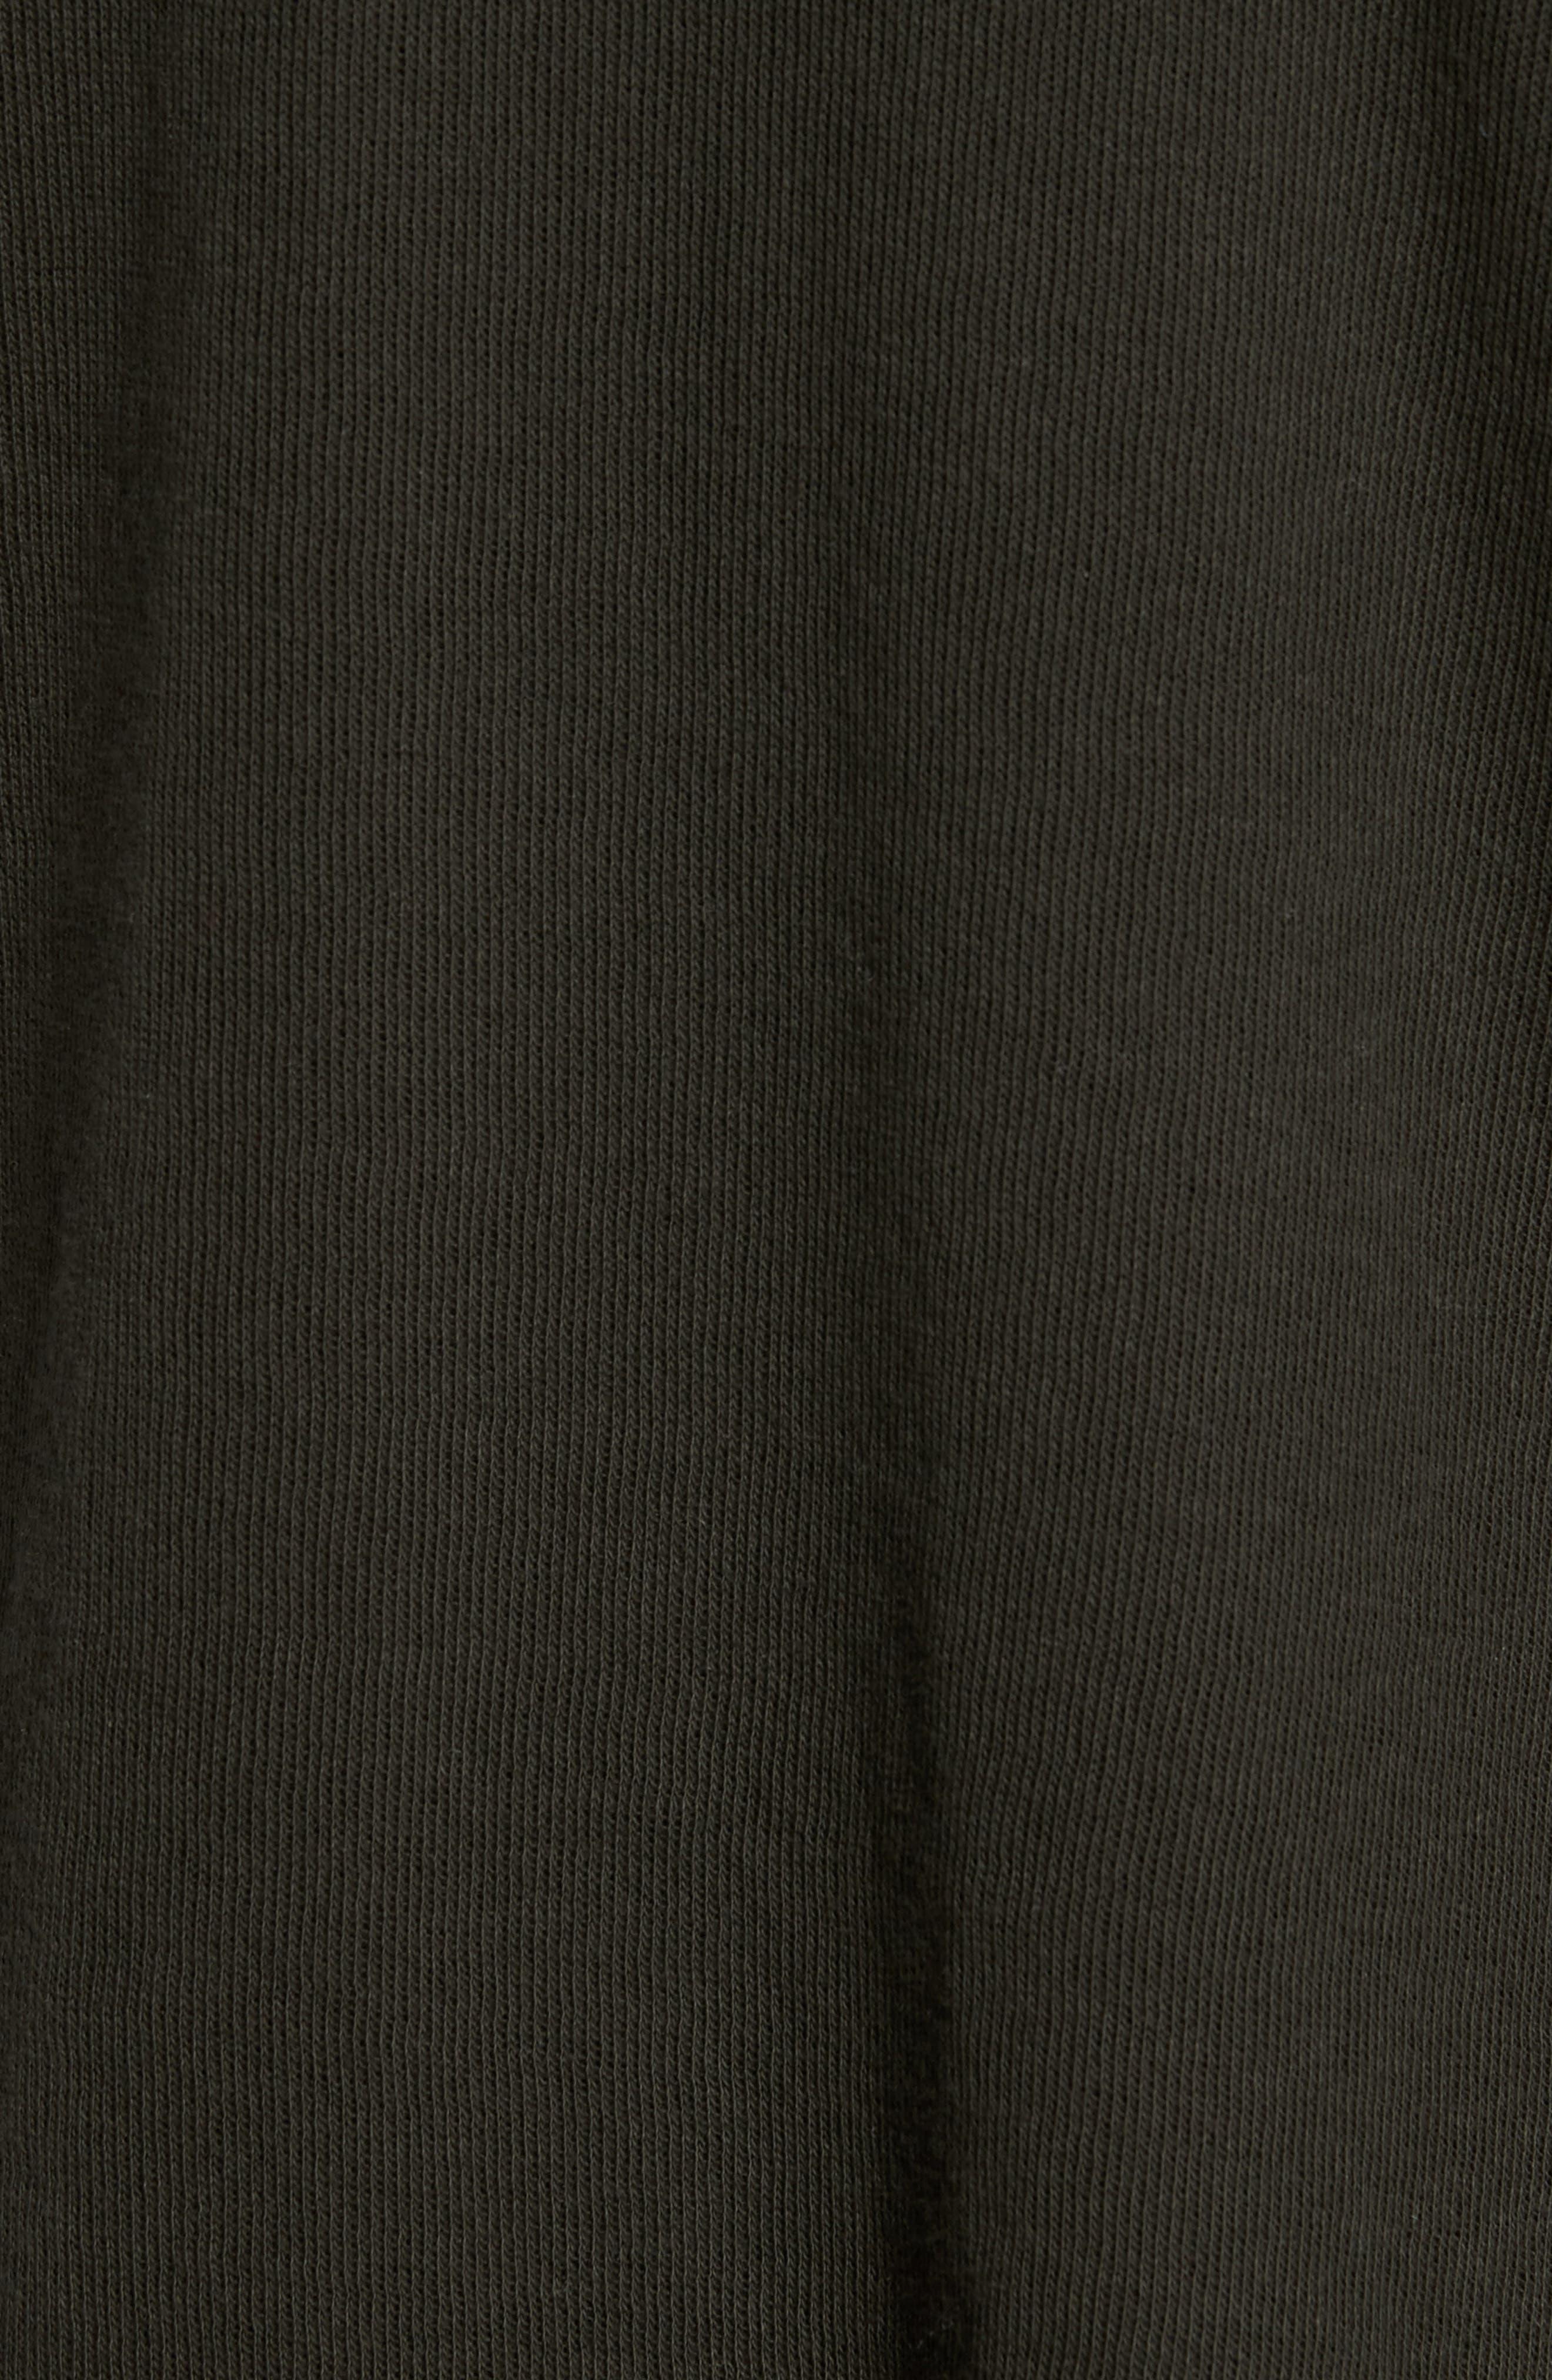 Double Knit Long Sleeve T-Shirt,                             Alternate thumbnail 24, color,